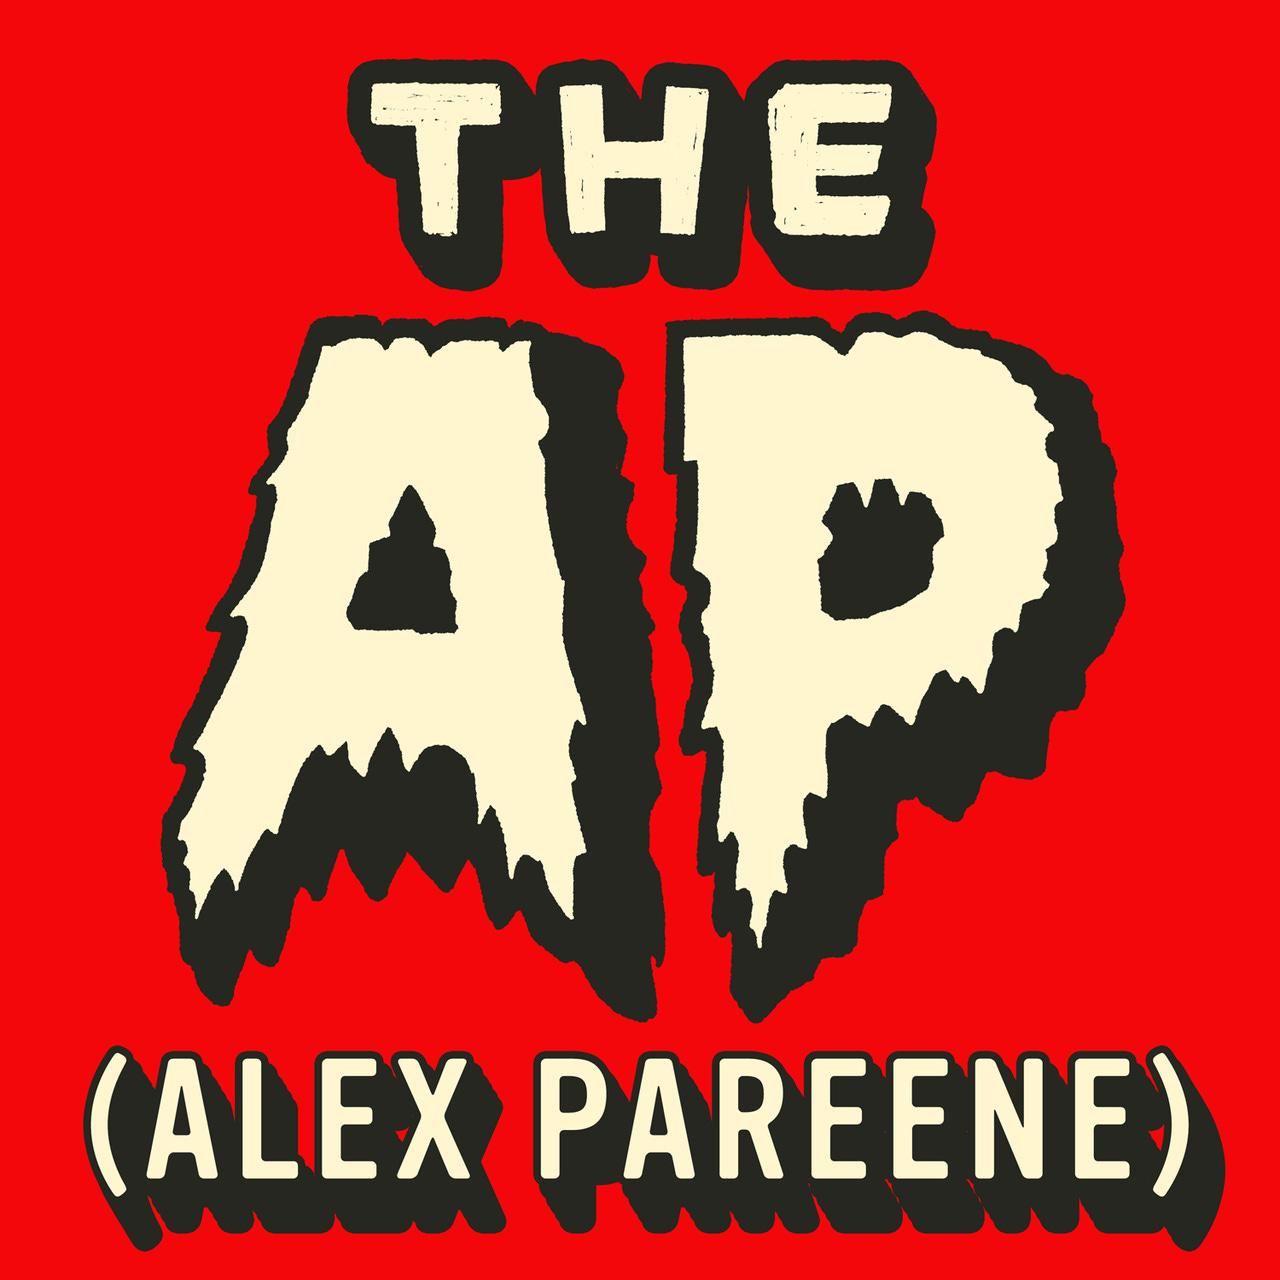 The AP (Alex Pareene) Newsletter